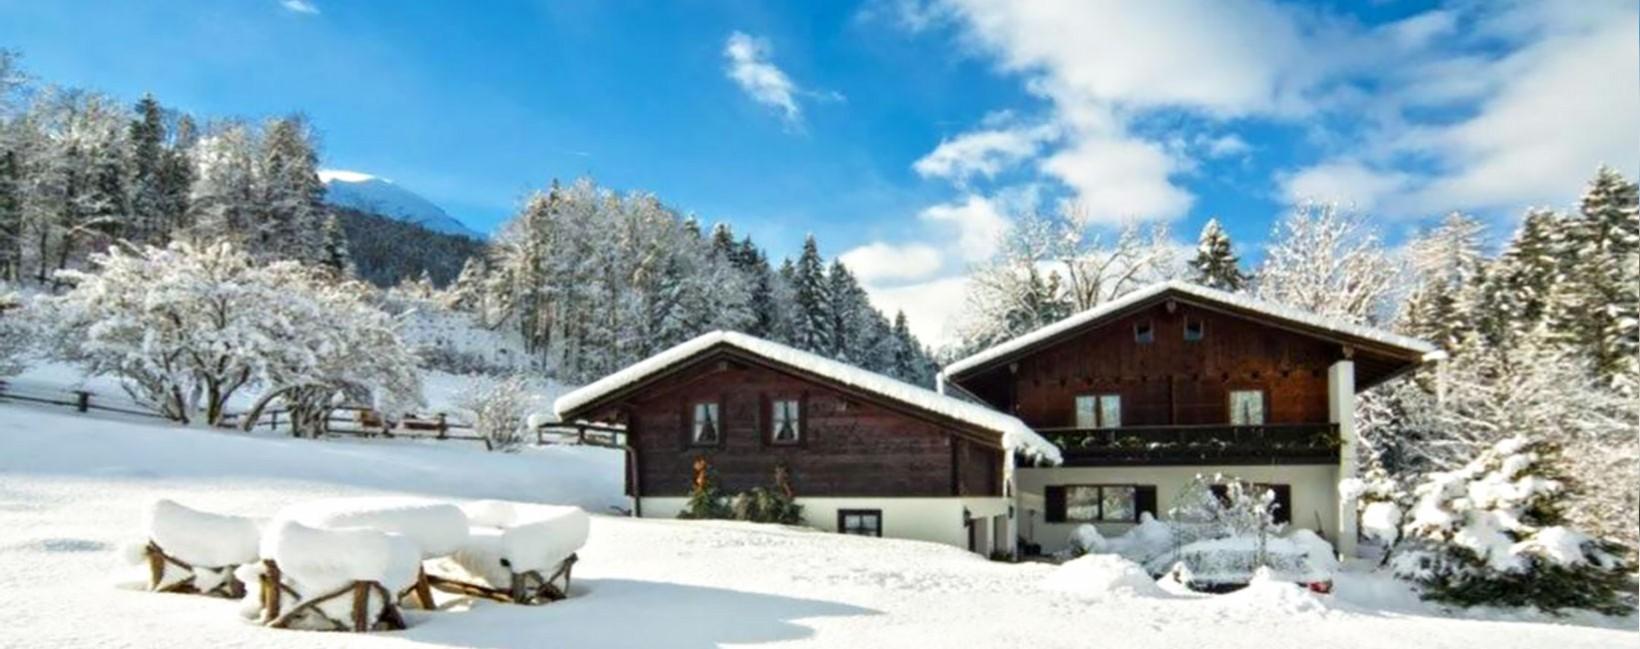 Appartementhaus Zechmeister im Winter